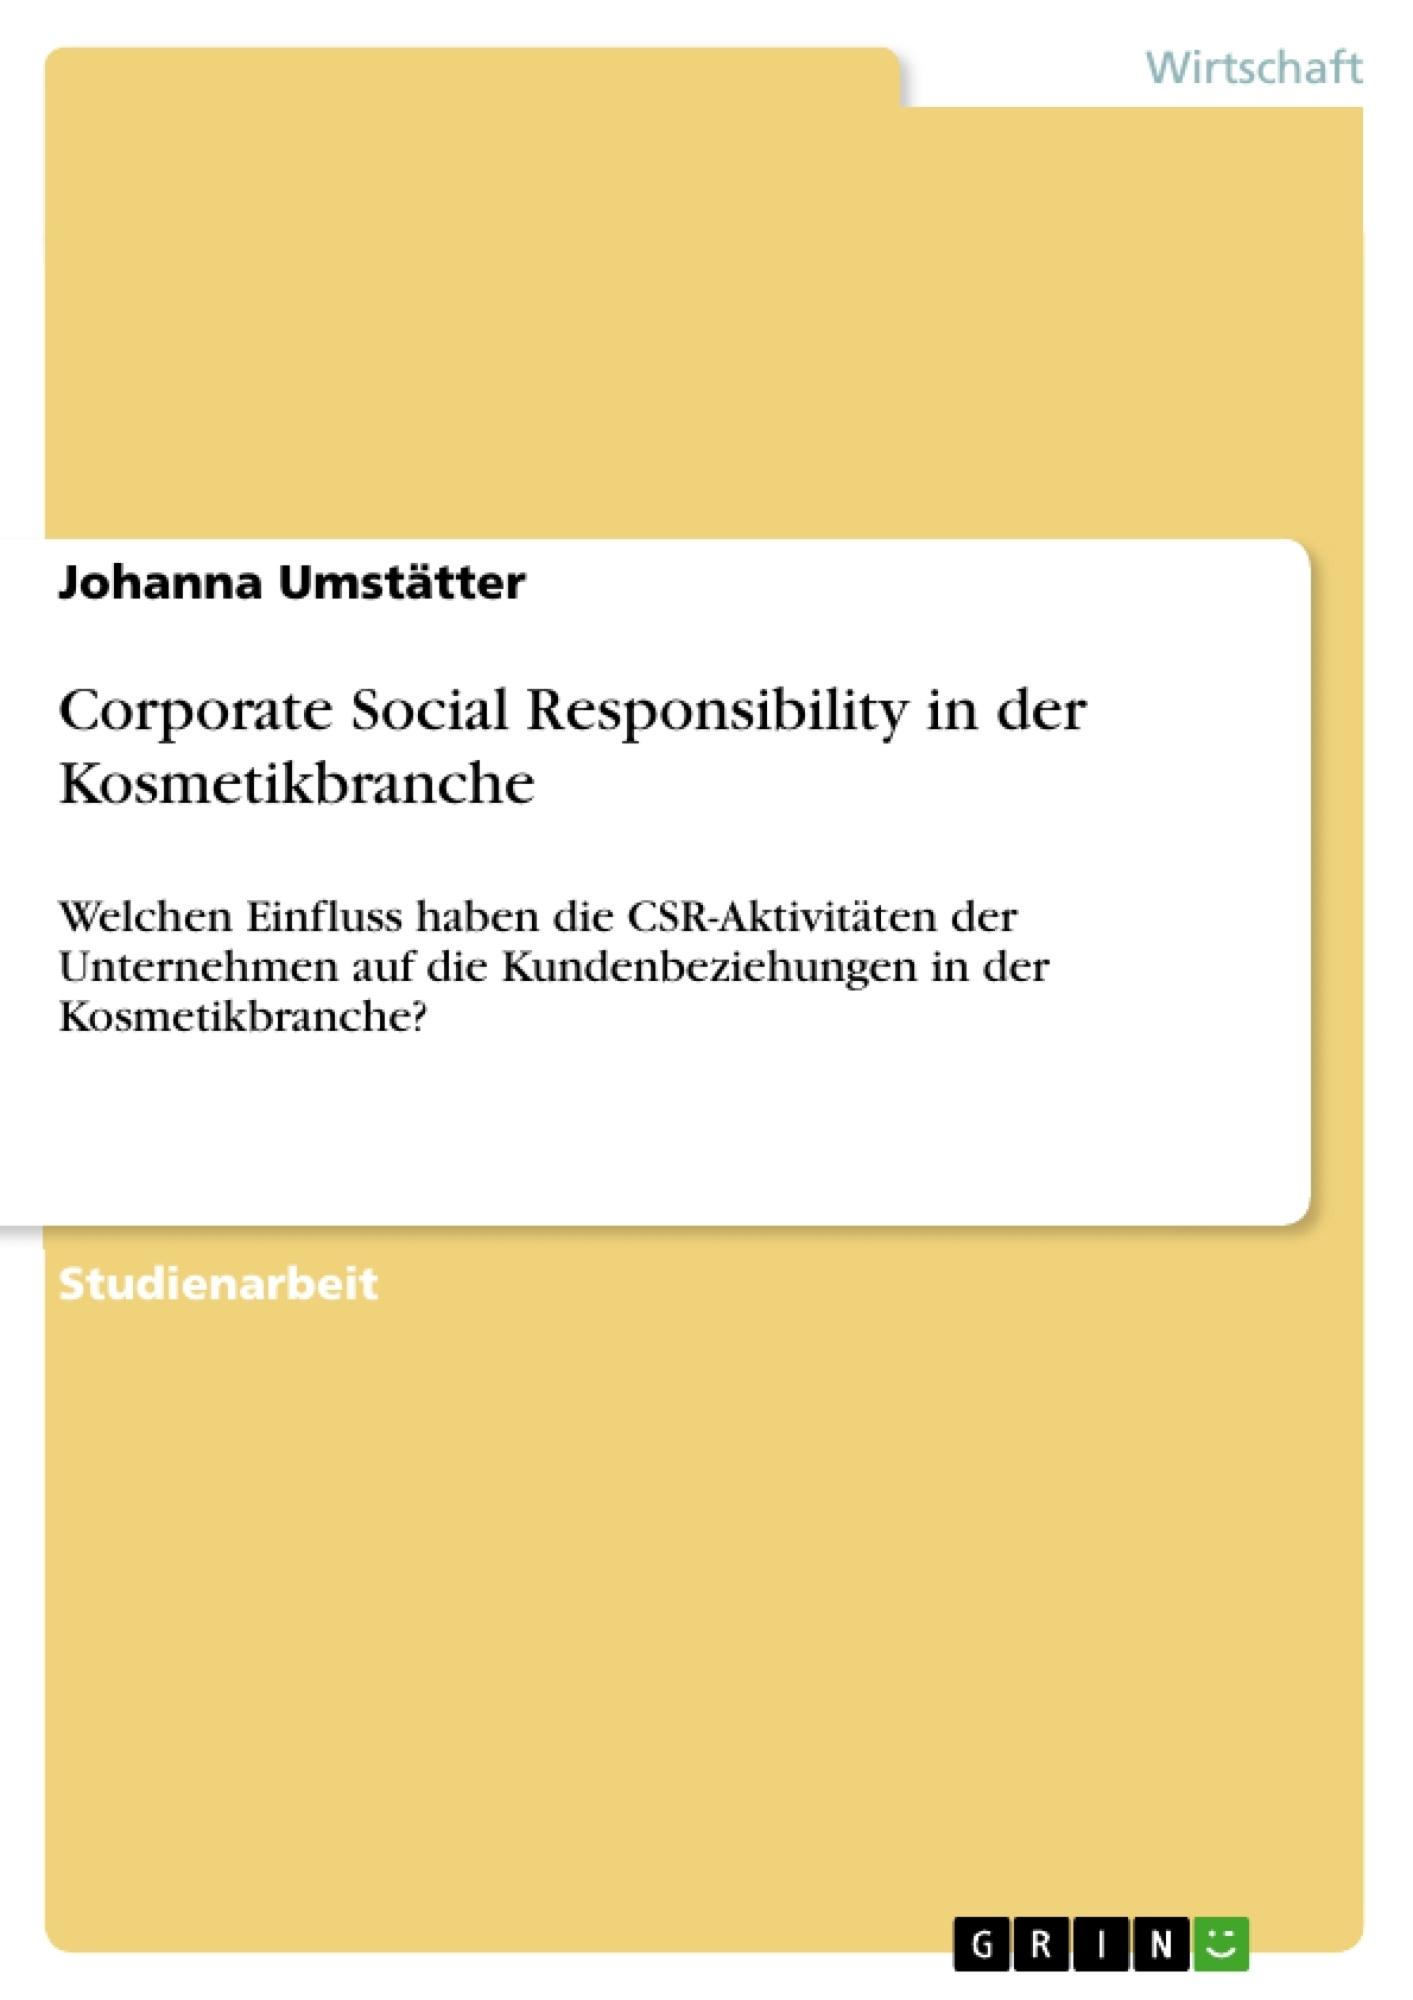 Titel: Corporate Social Responsibility in der Kosmetikbranche